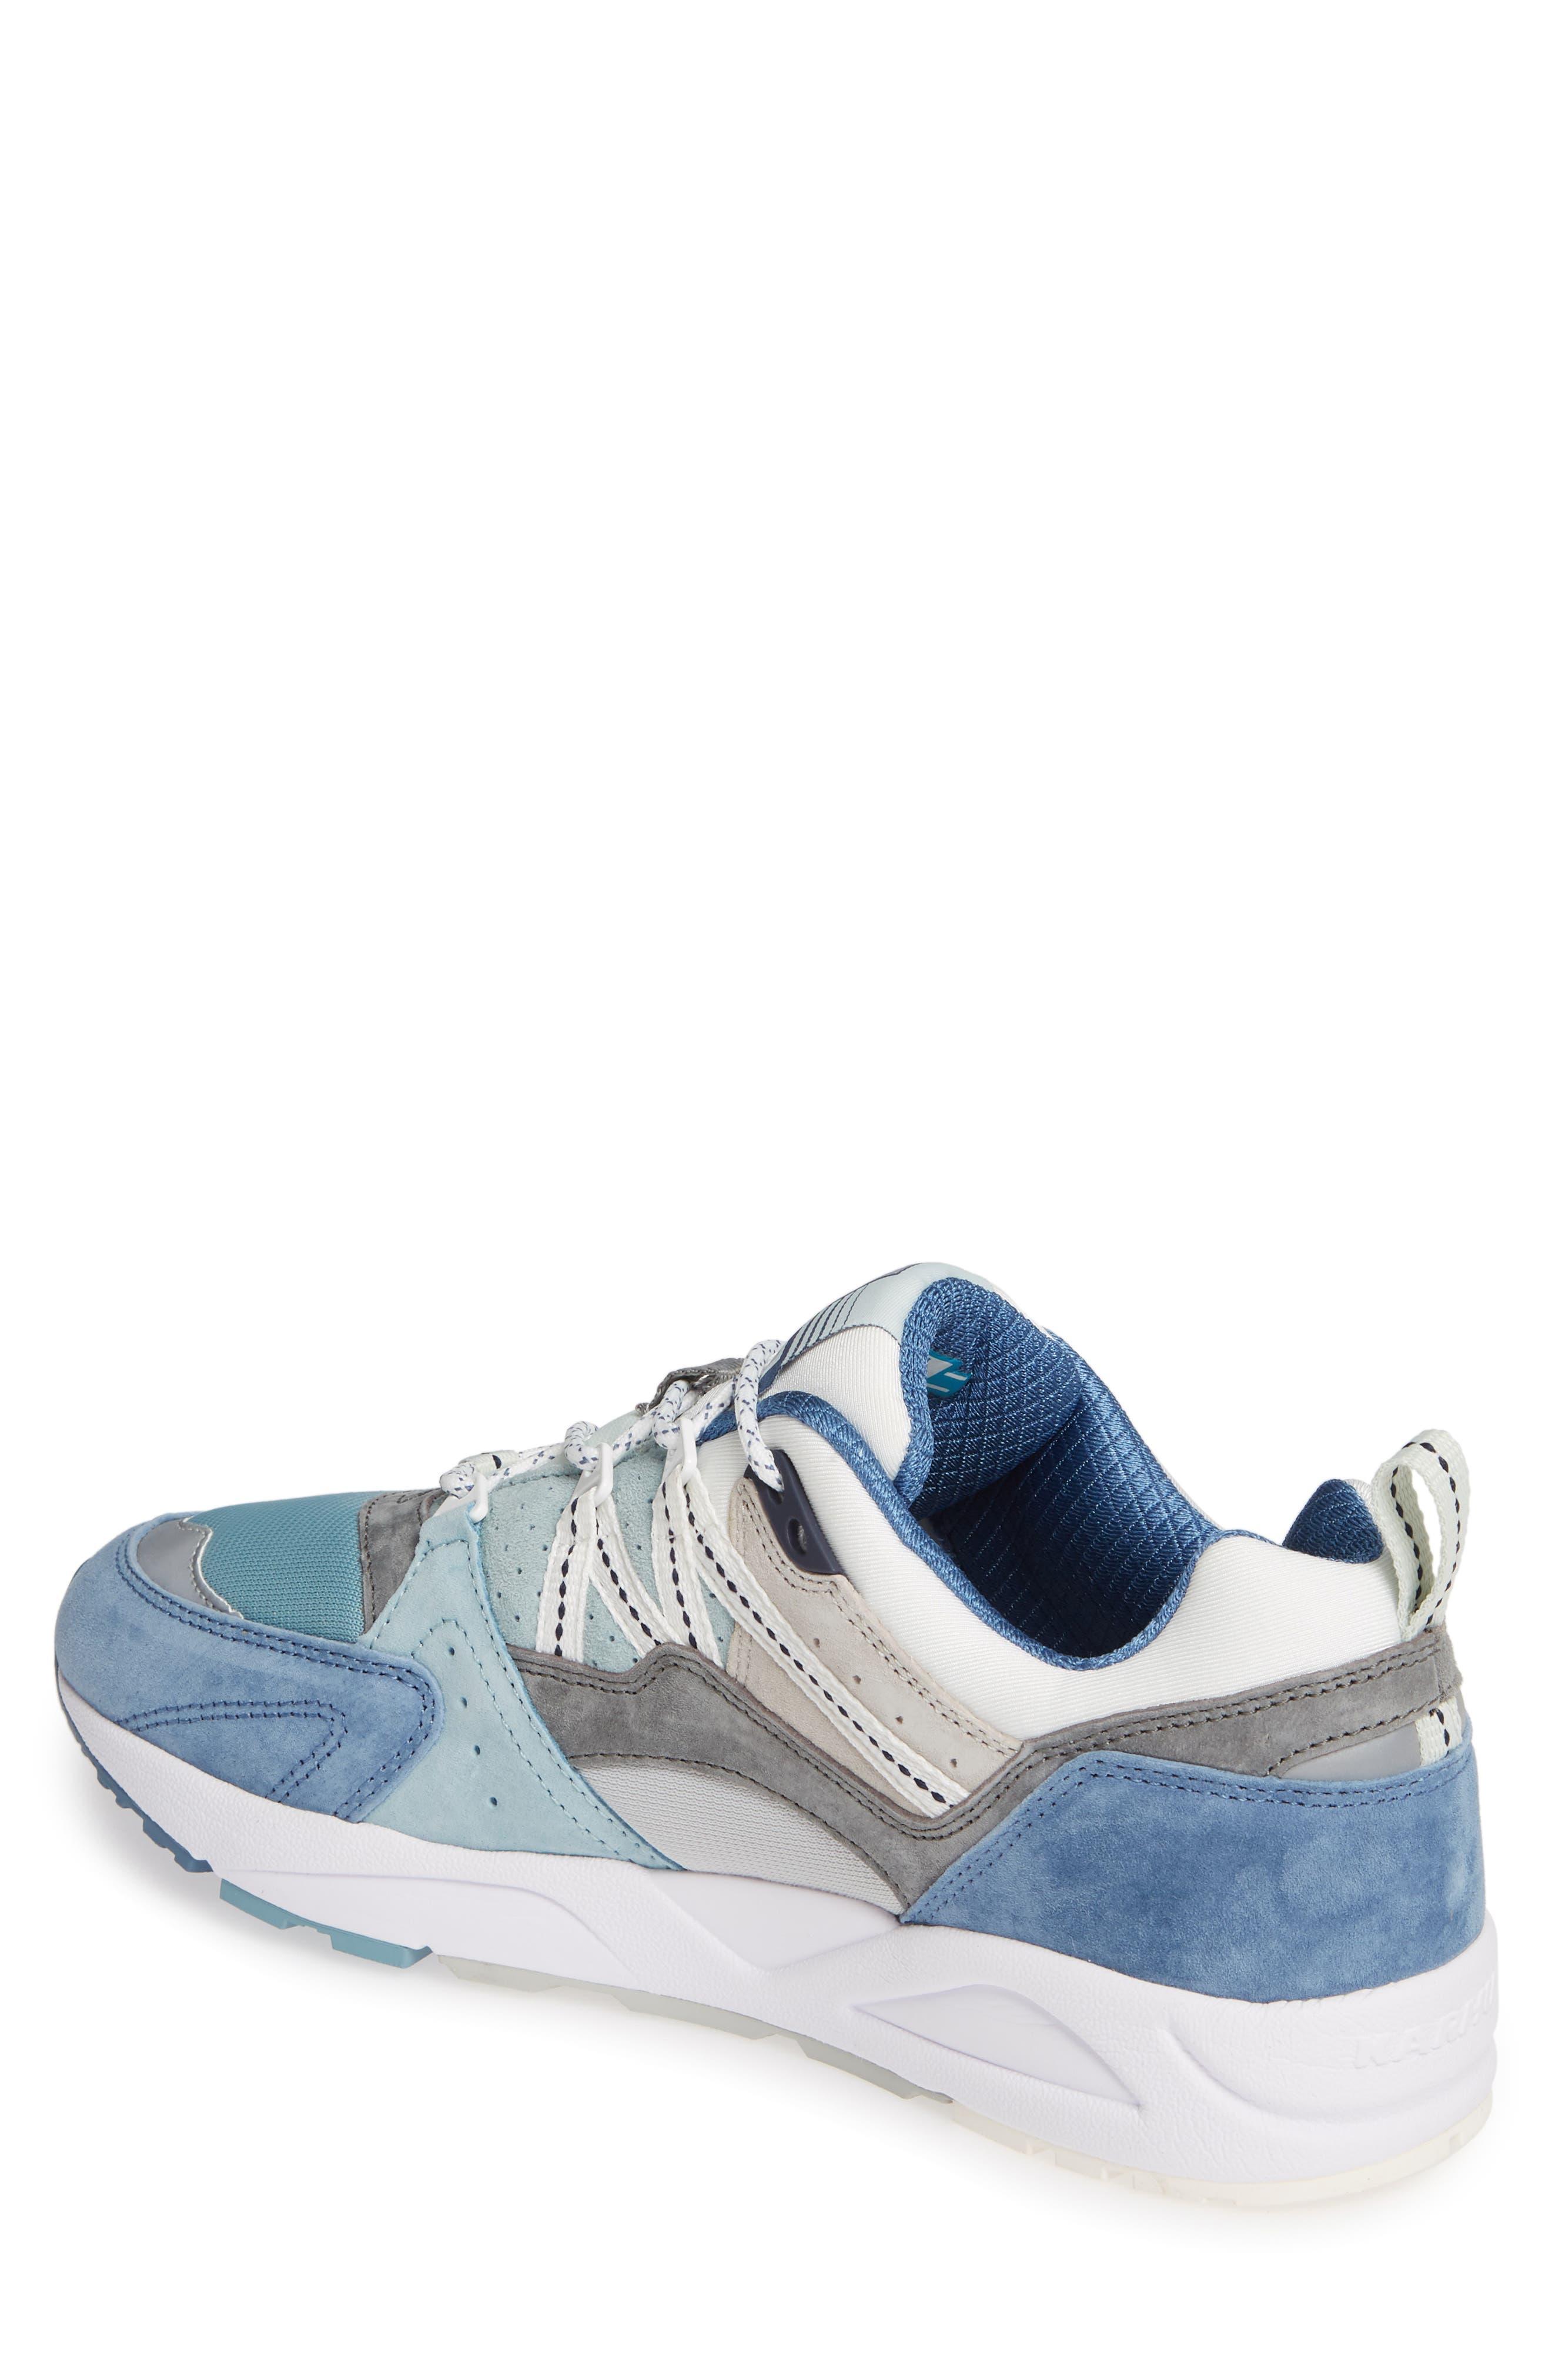 Fusion 2.0 Sneaker,                             Alternate thumbnail 2, color,                             210